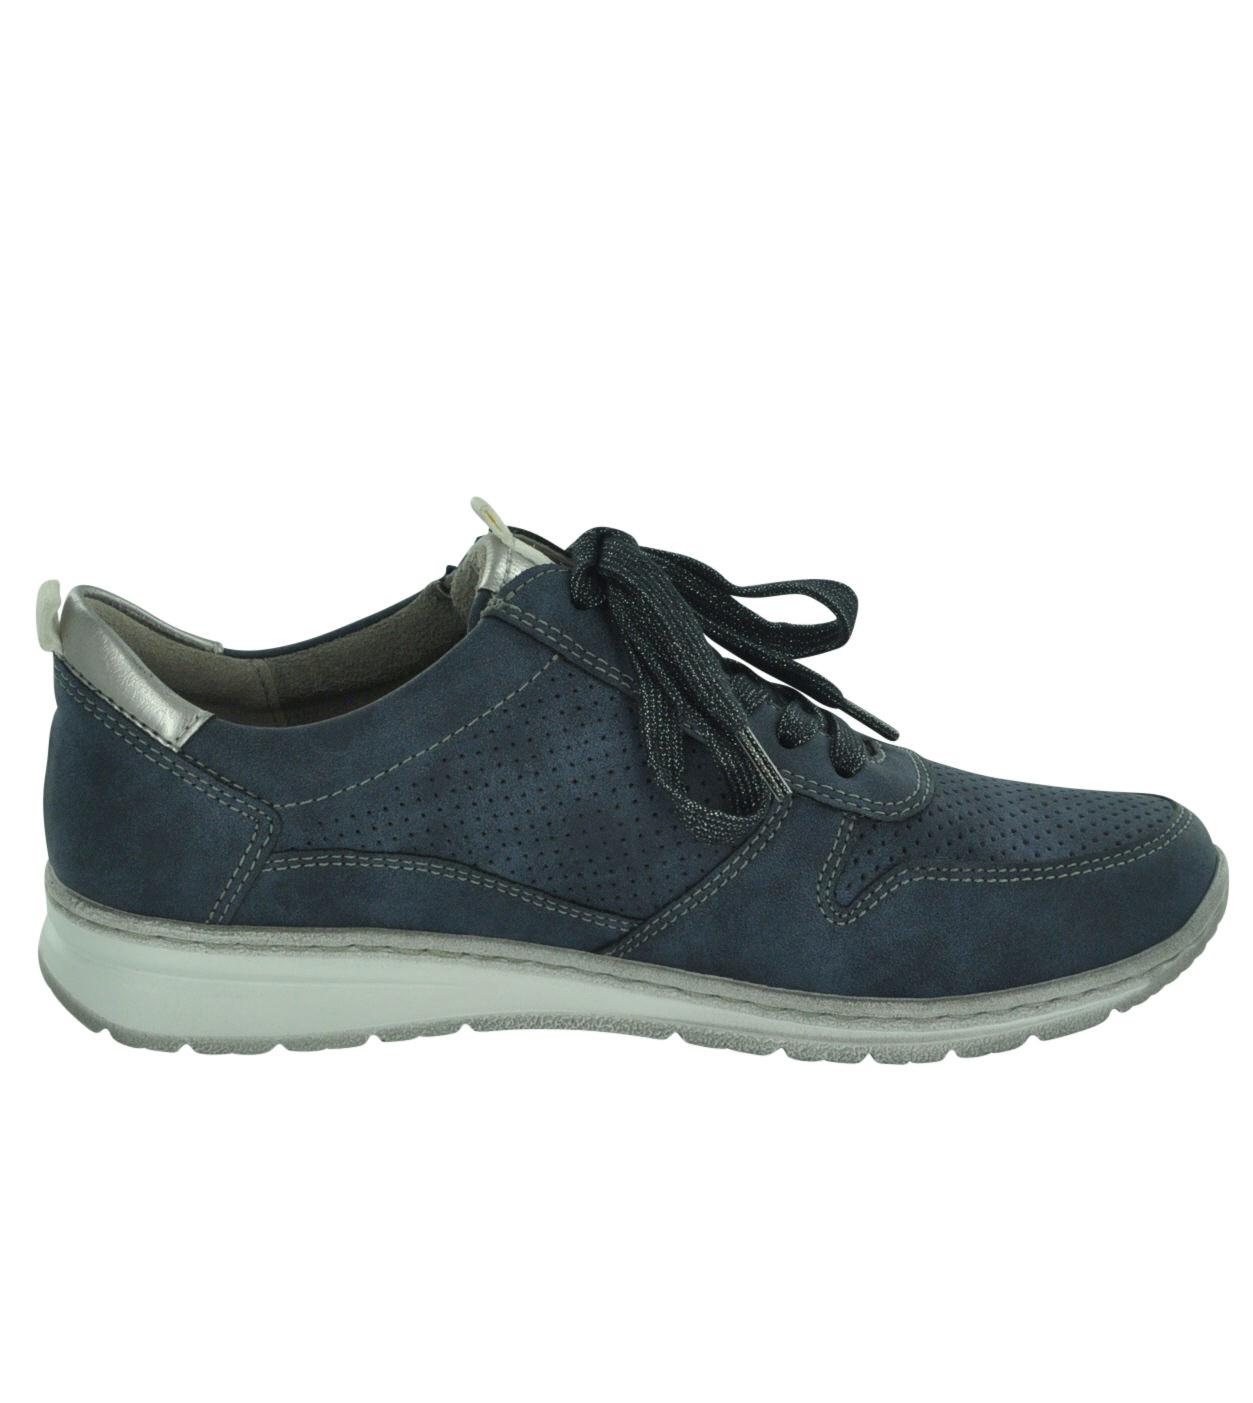 3d0f6ace Jenny by Ara 52403 Sapporo Women's Trainers | Ara Shoes Ireland ...